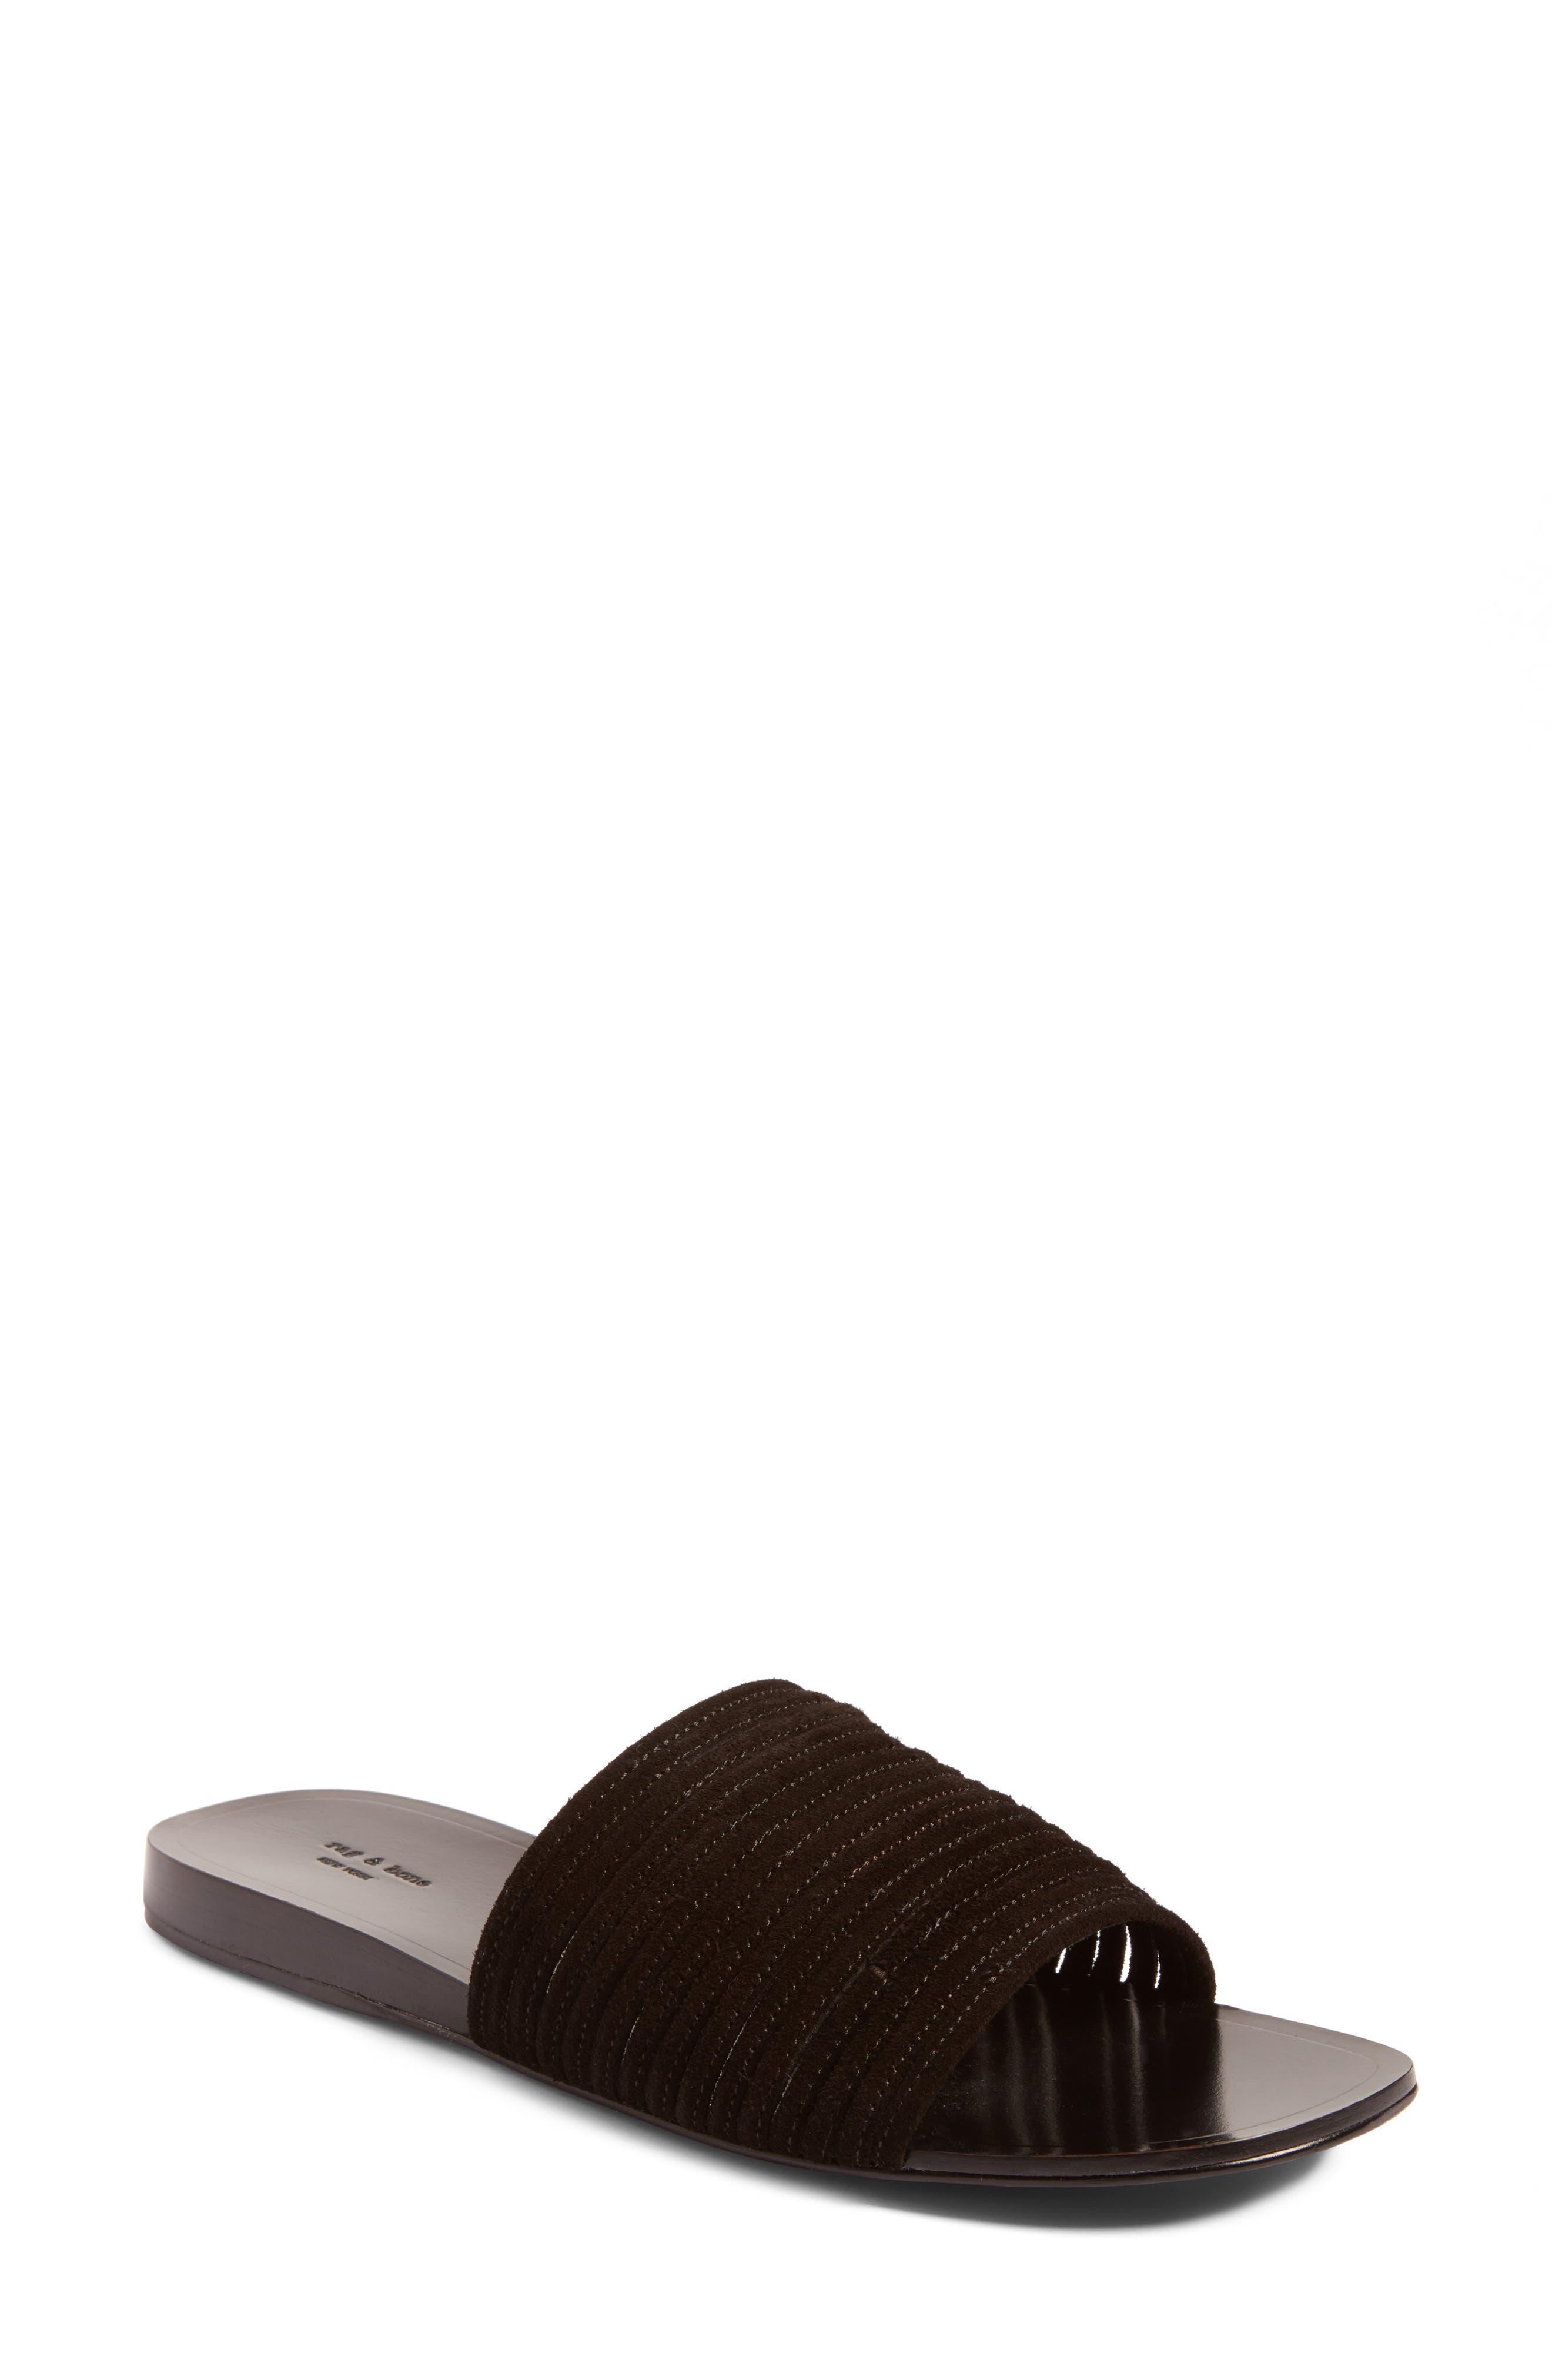 Cameron Slide Sandal,                         Main,                         color, 008